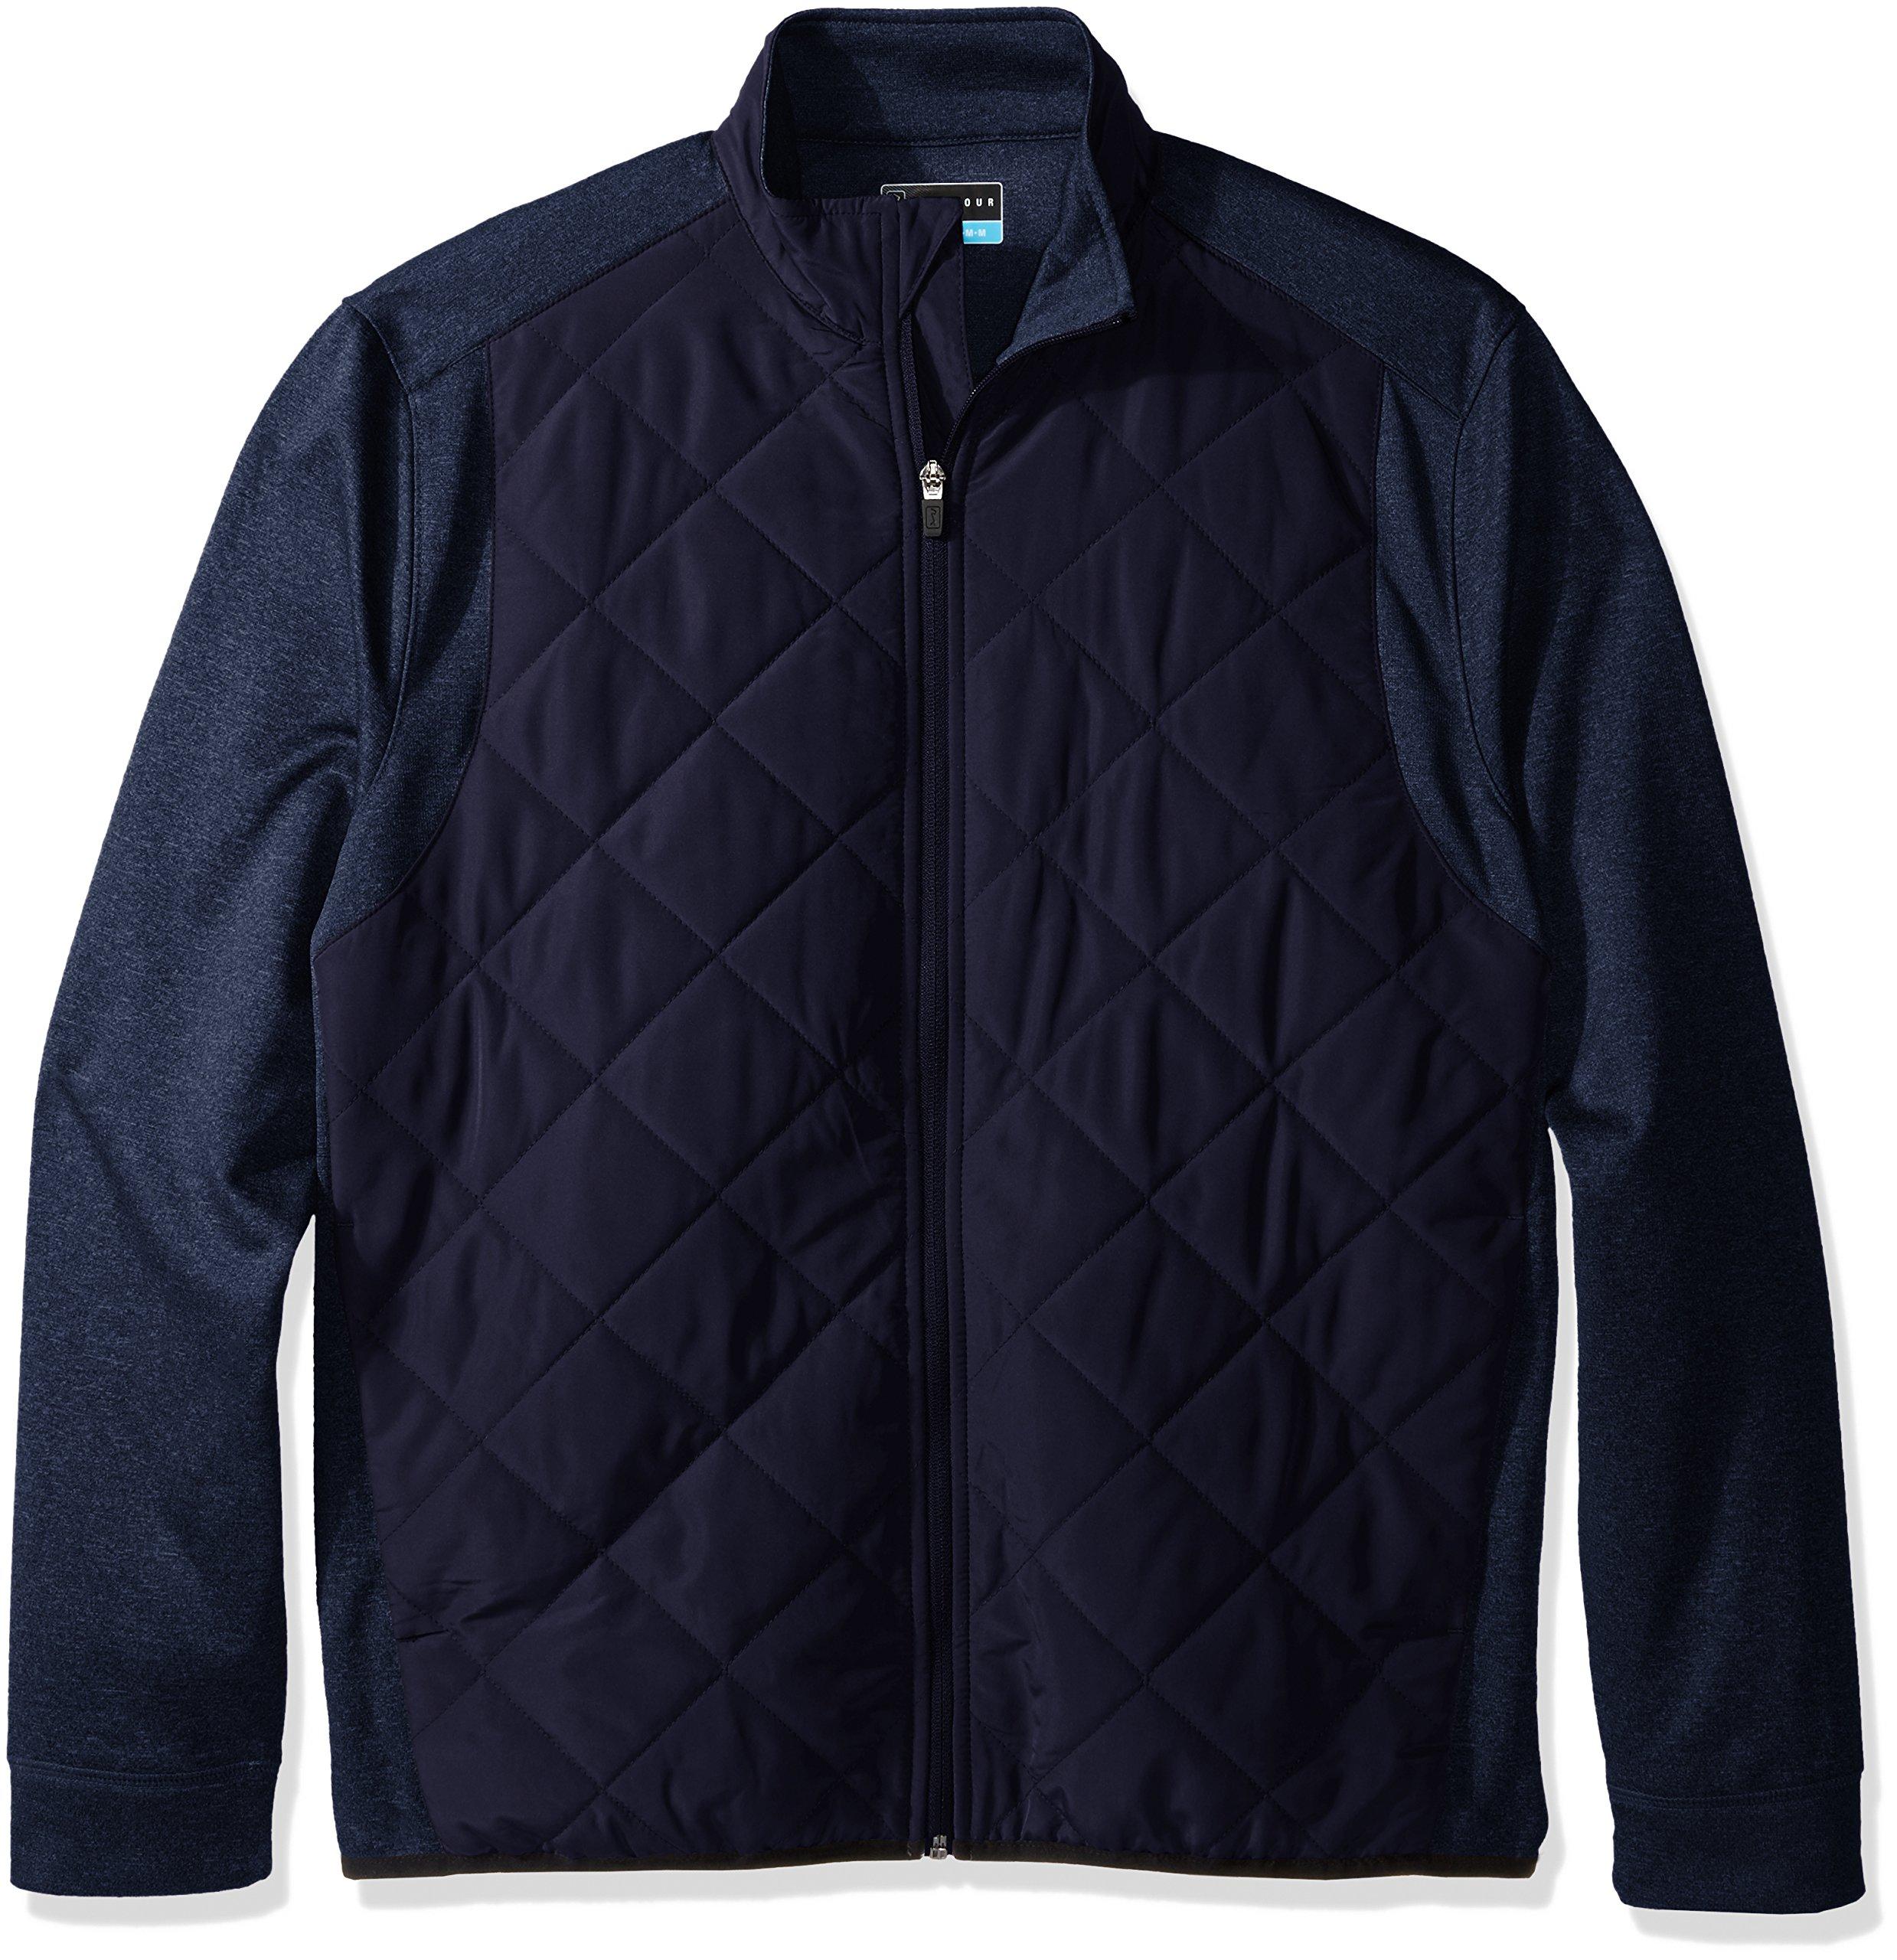 PGA TOUR Men's Elements Long Sleeve Full Zip Quilted Mixed Media Jacket, Peacoat, XL